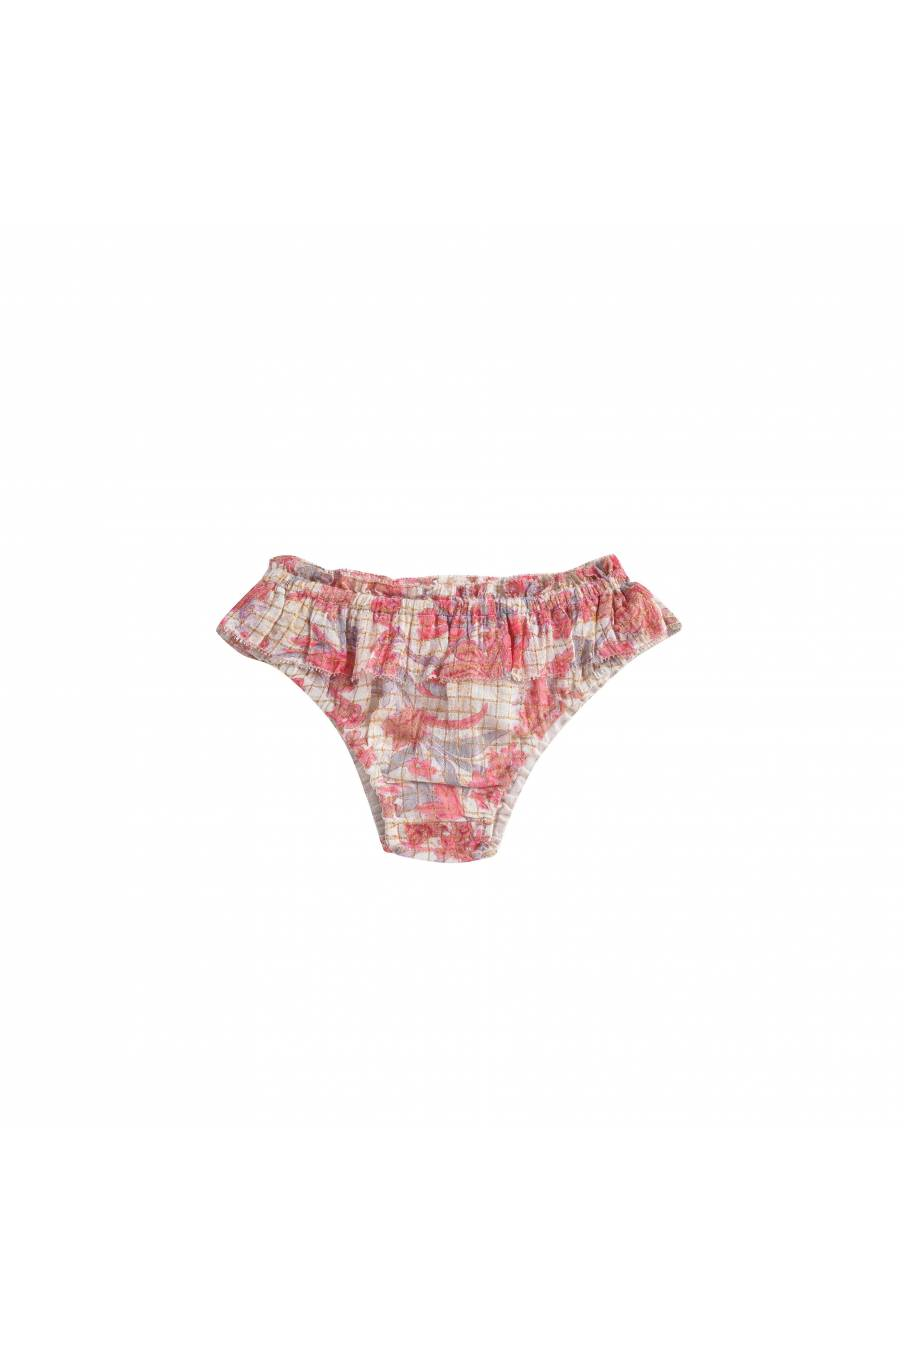 Panties Mimi Pink Flowers